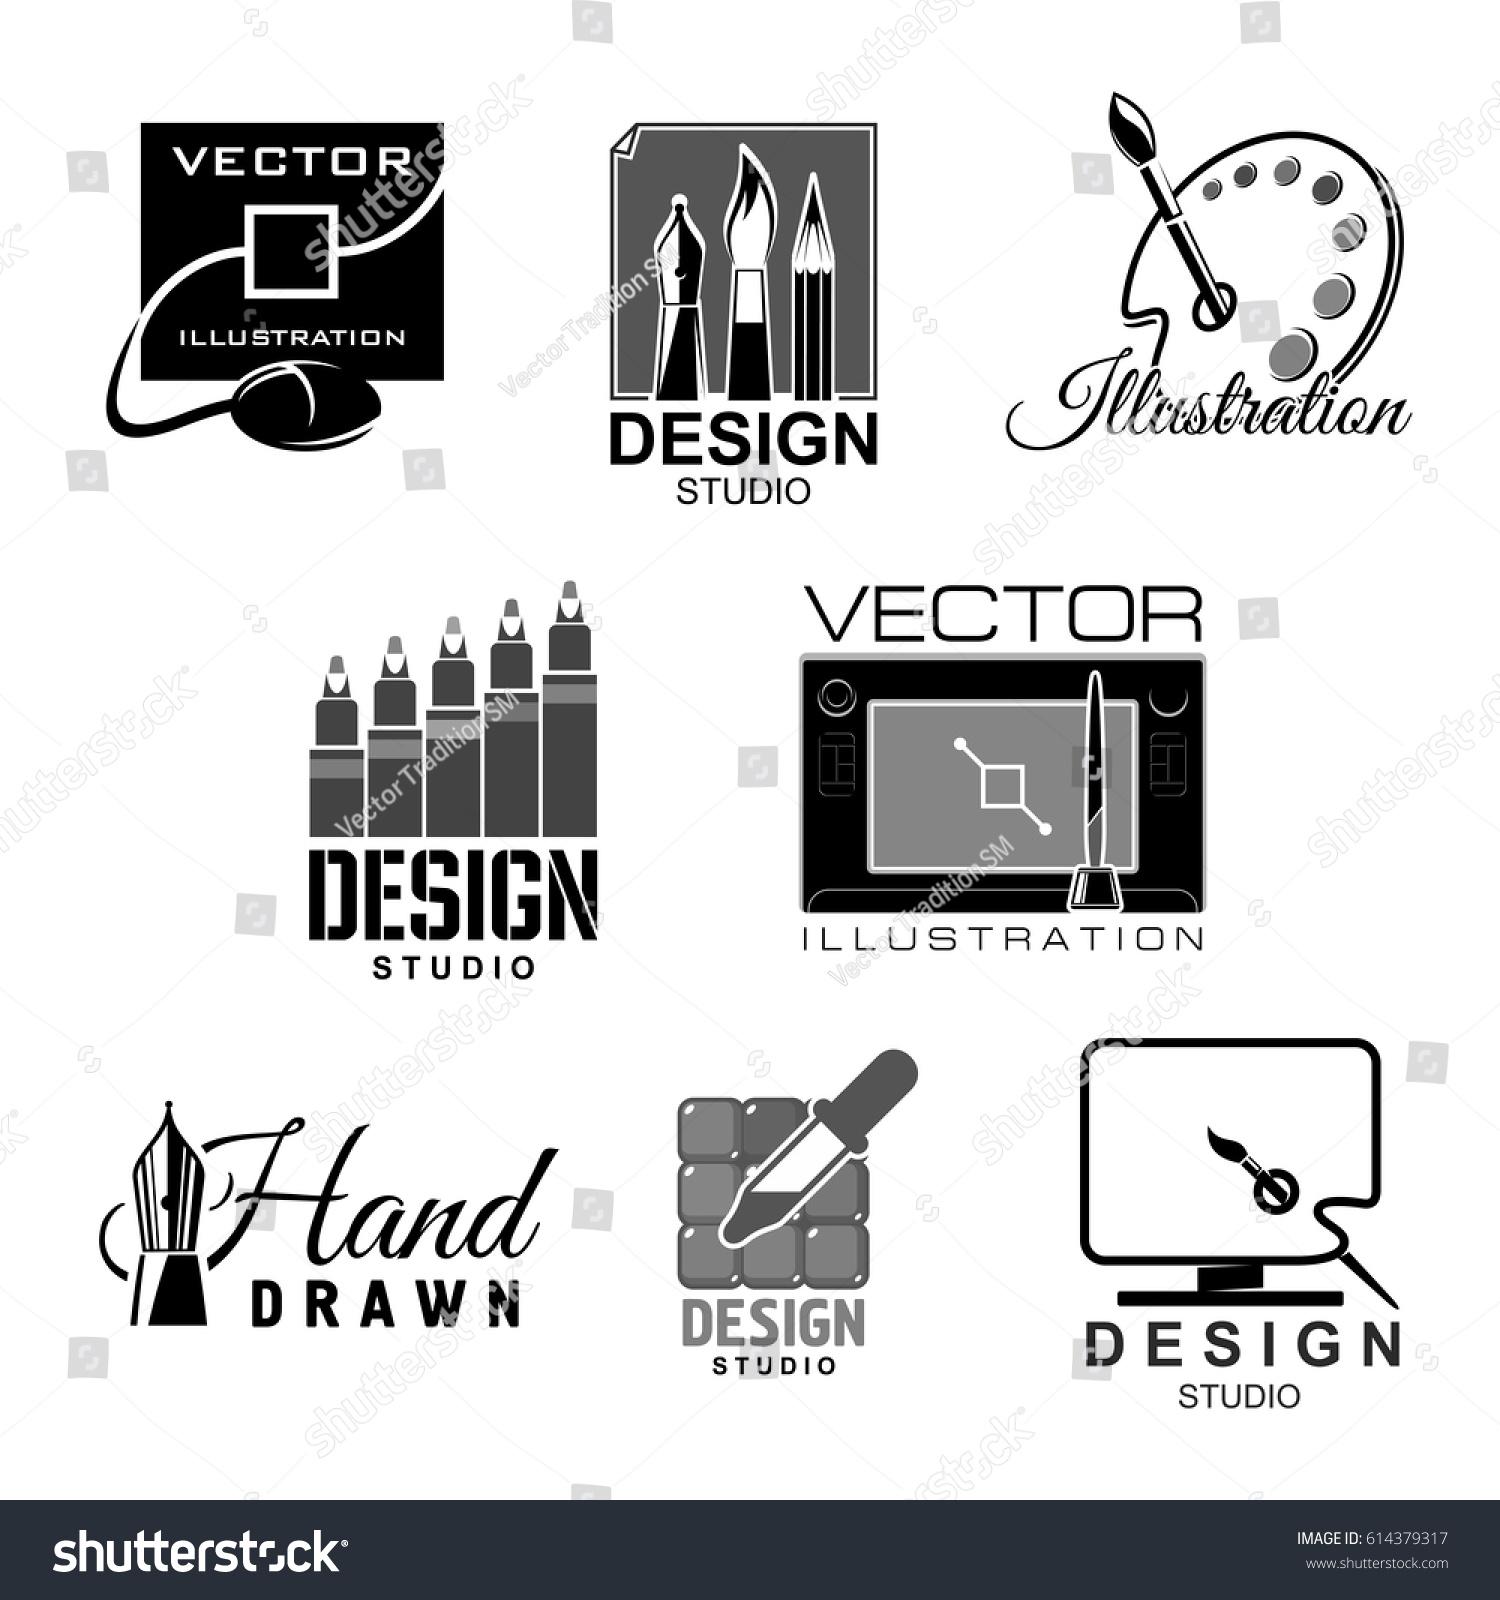 Design Studio Template Icons Graphic Illustration Stock Vector ...